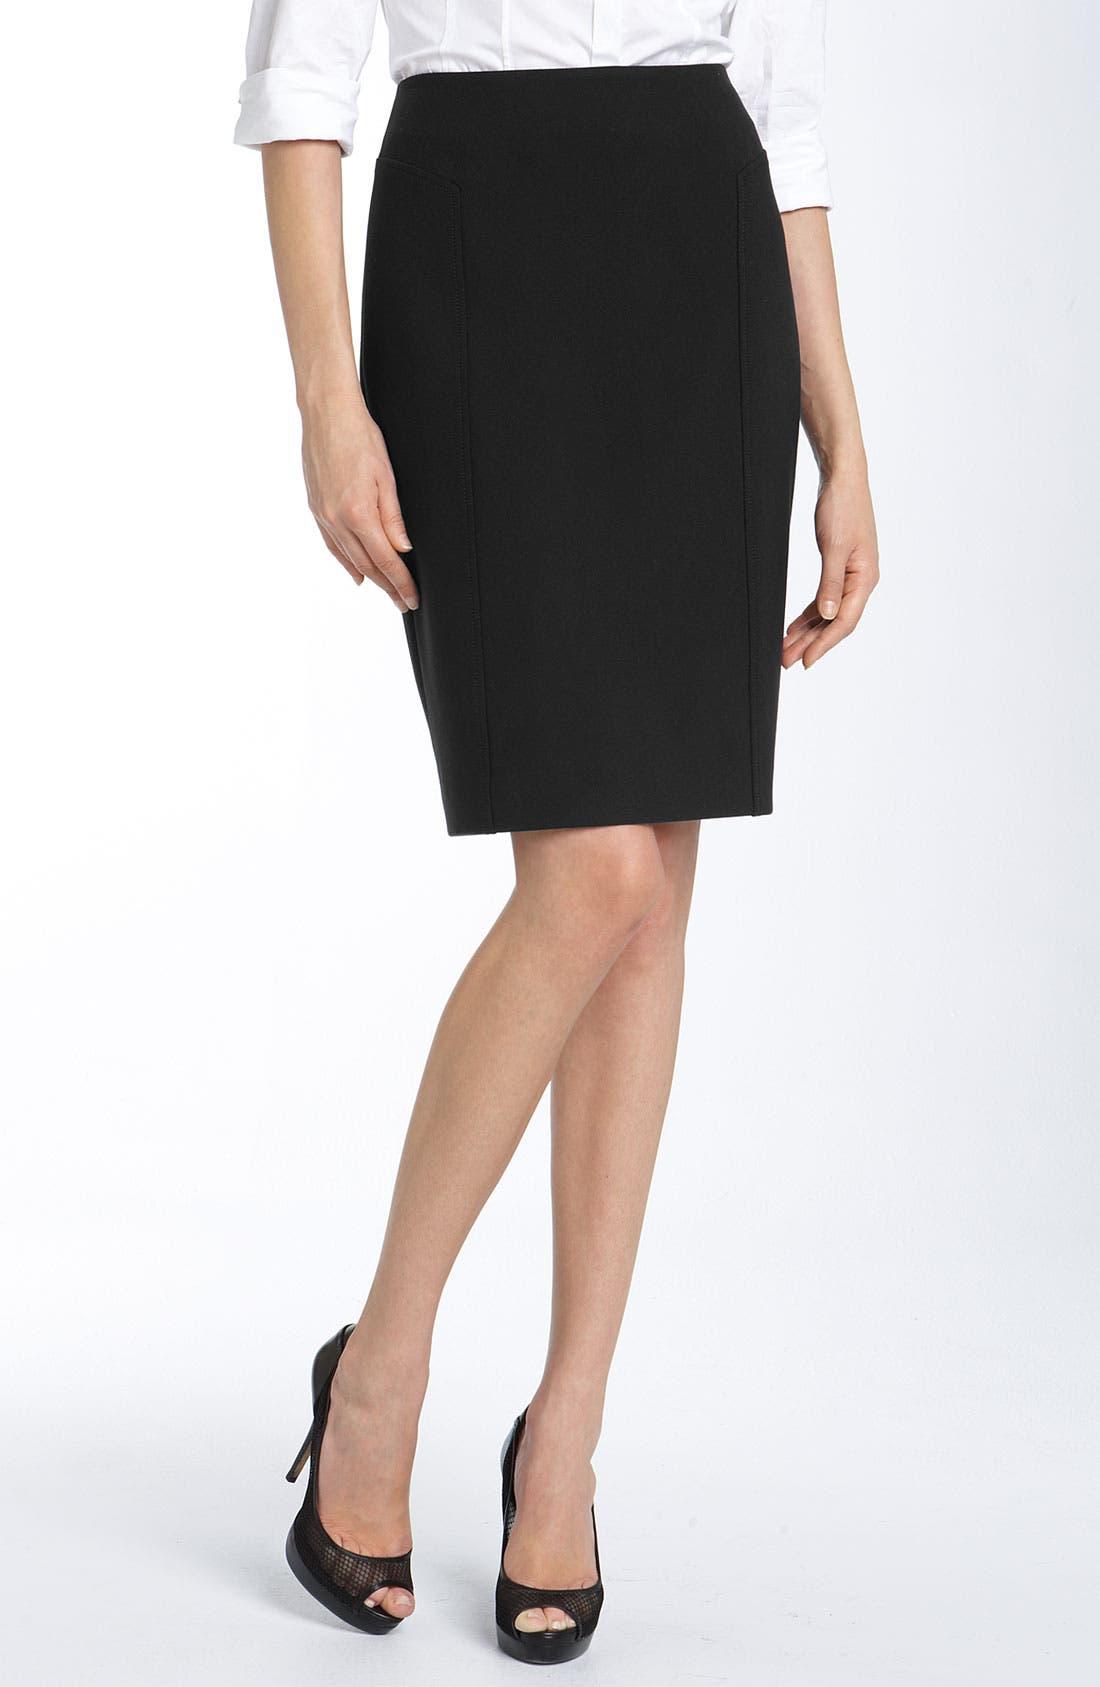 Alternate Image 1 Selected - Halogen® Seamed Pencil Skirt